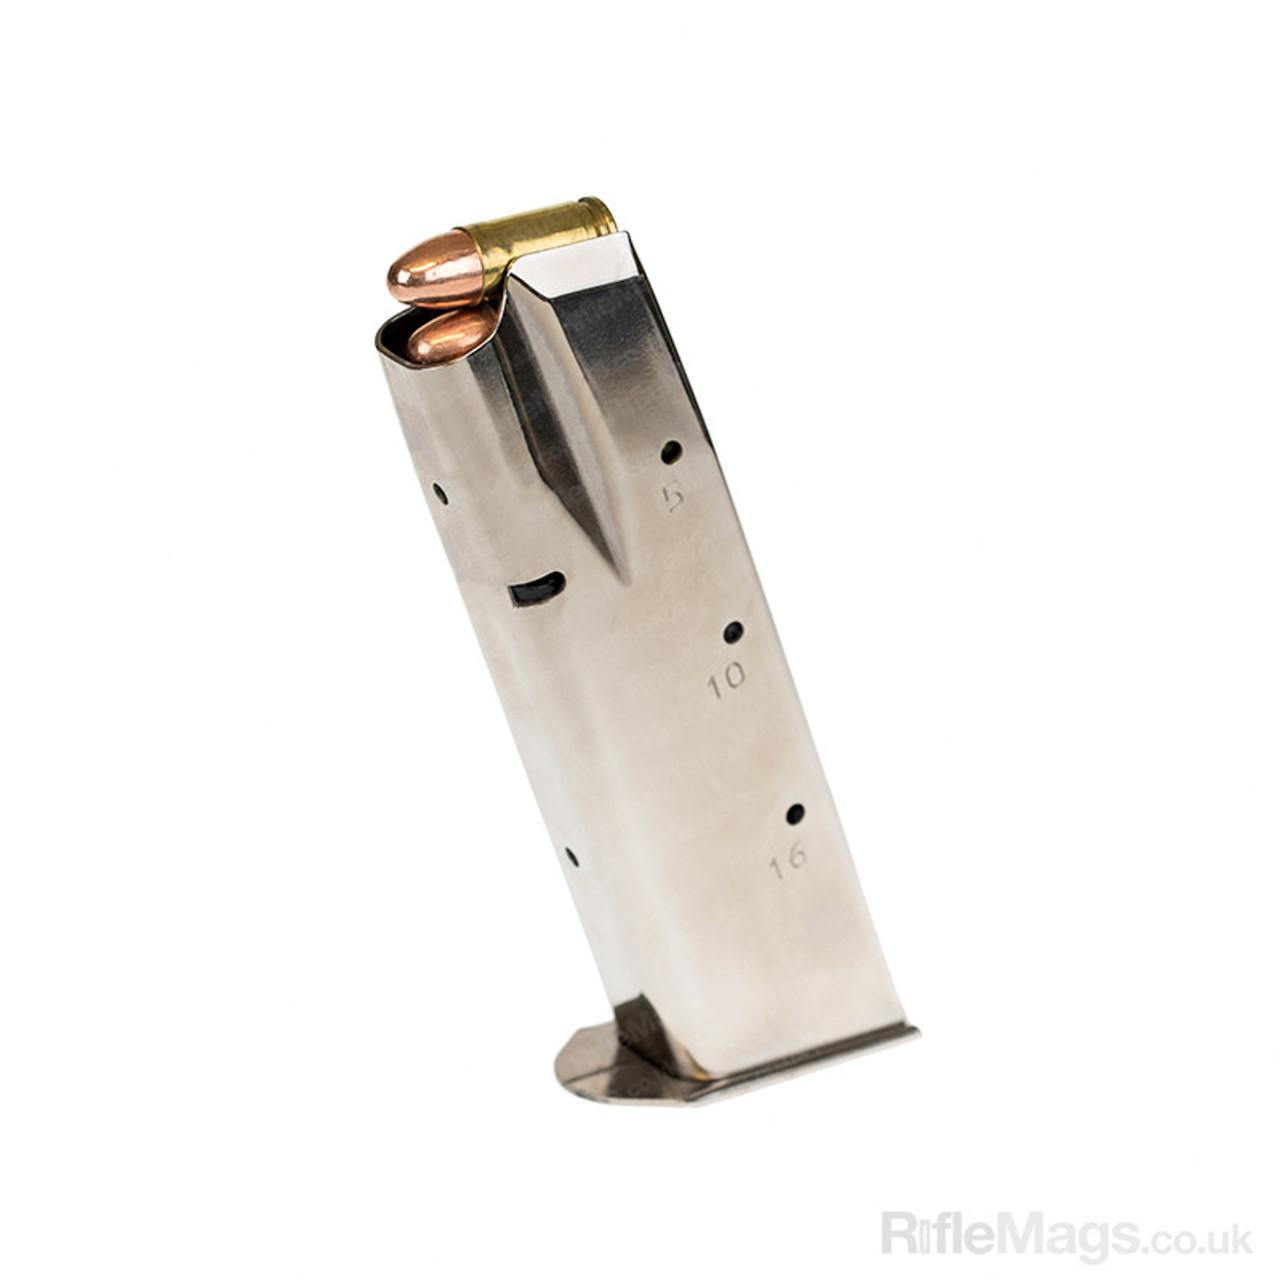 CZ 75/85 16 round nickel plated 9mm magazine